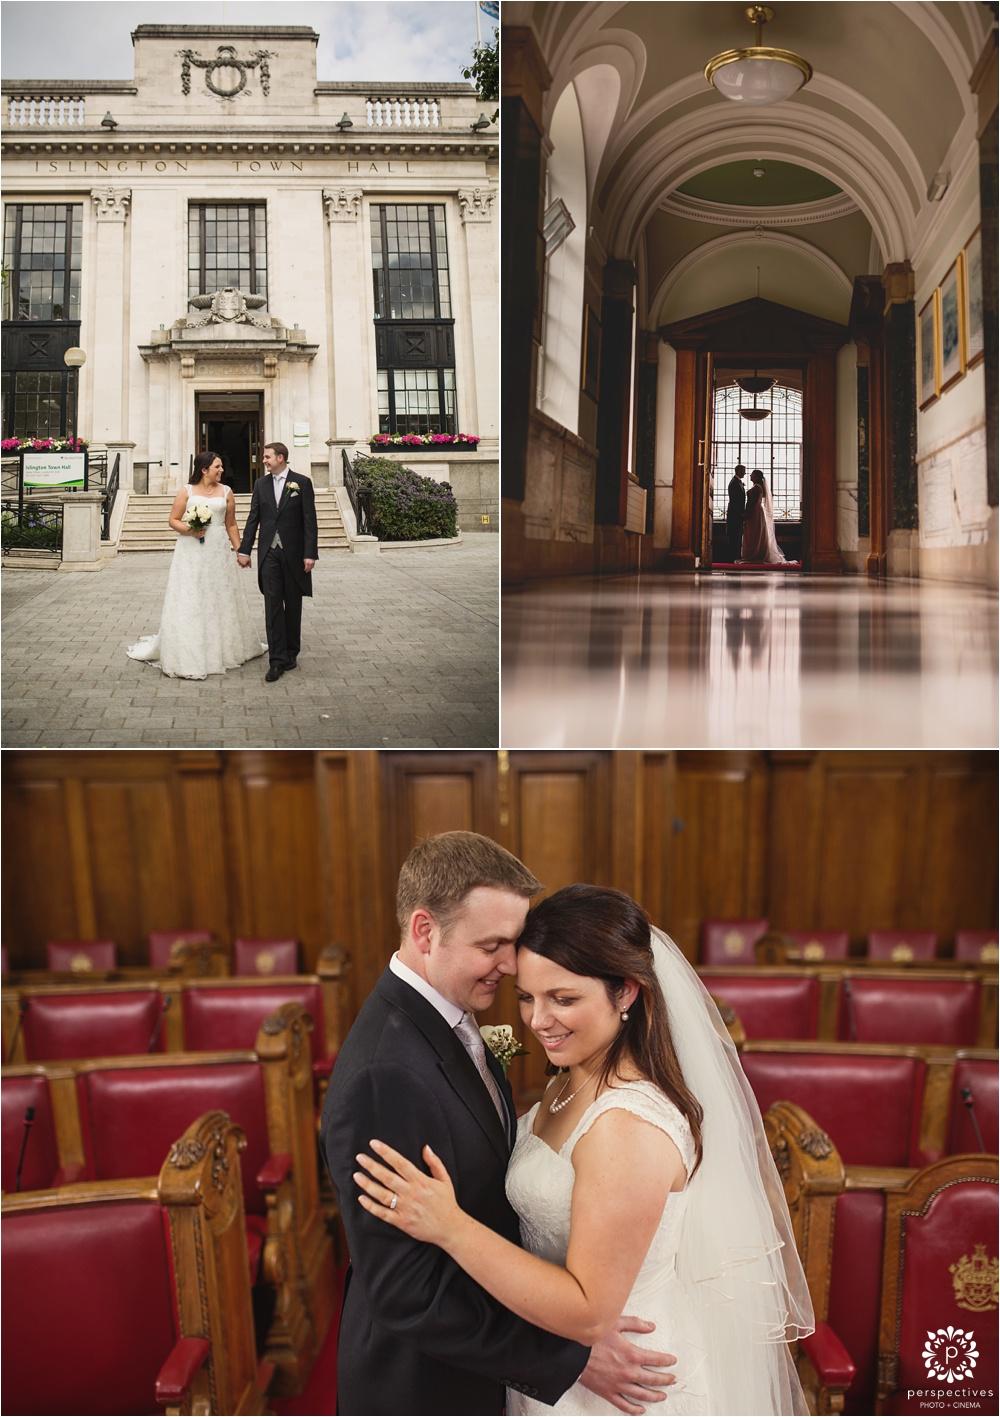 Destination wedding photos London